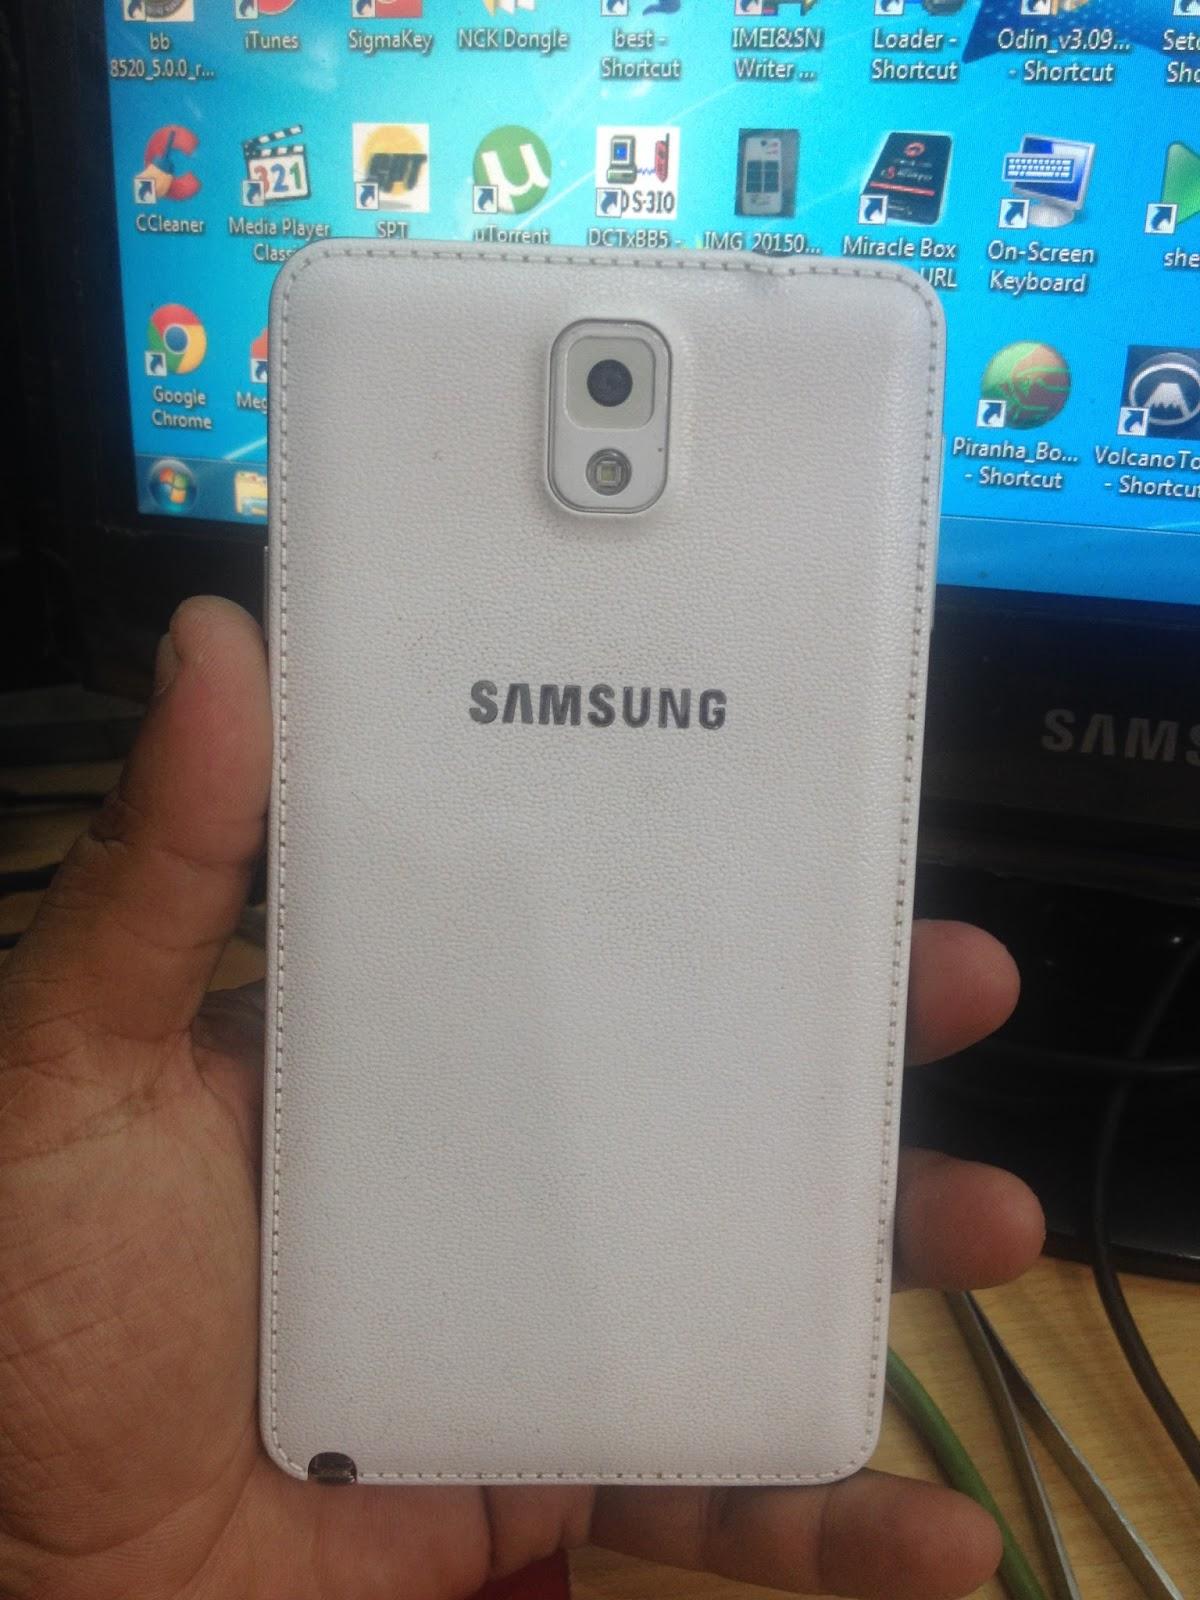 SAMSUNG SM N900 CLONE STOCK ROM